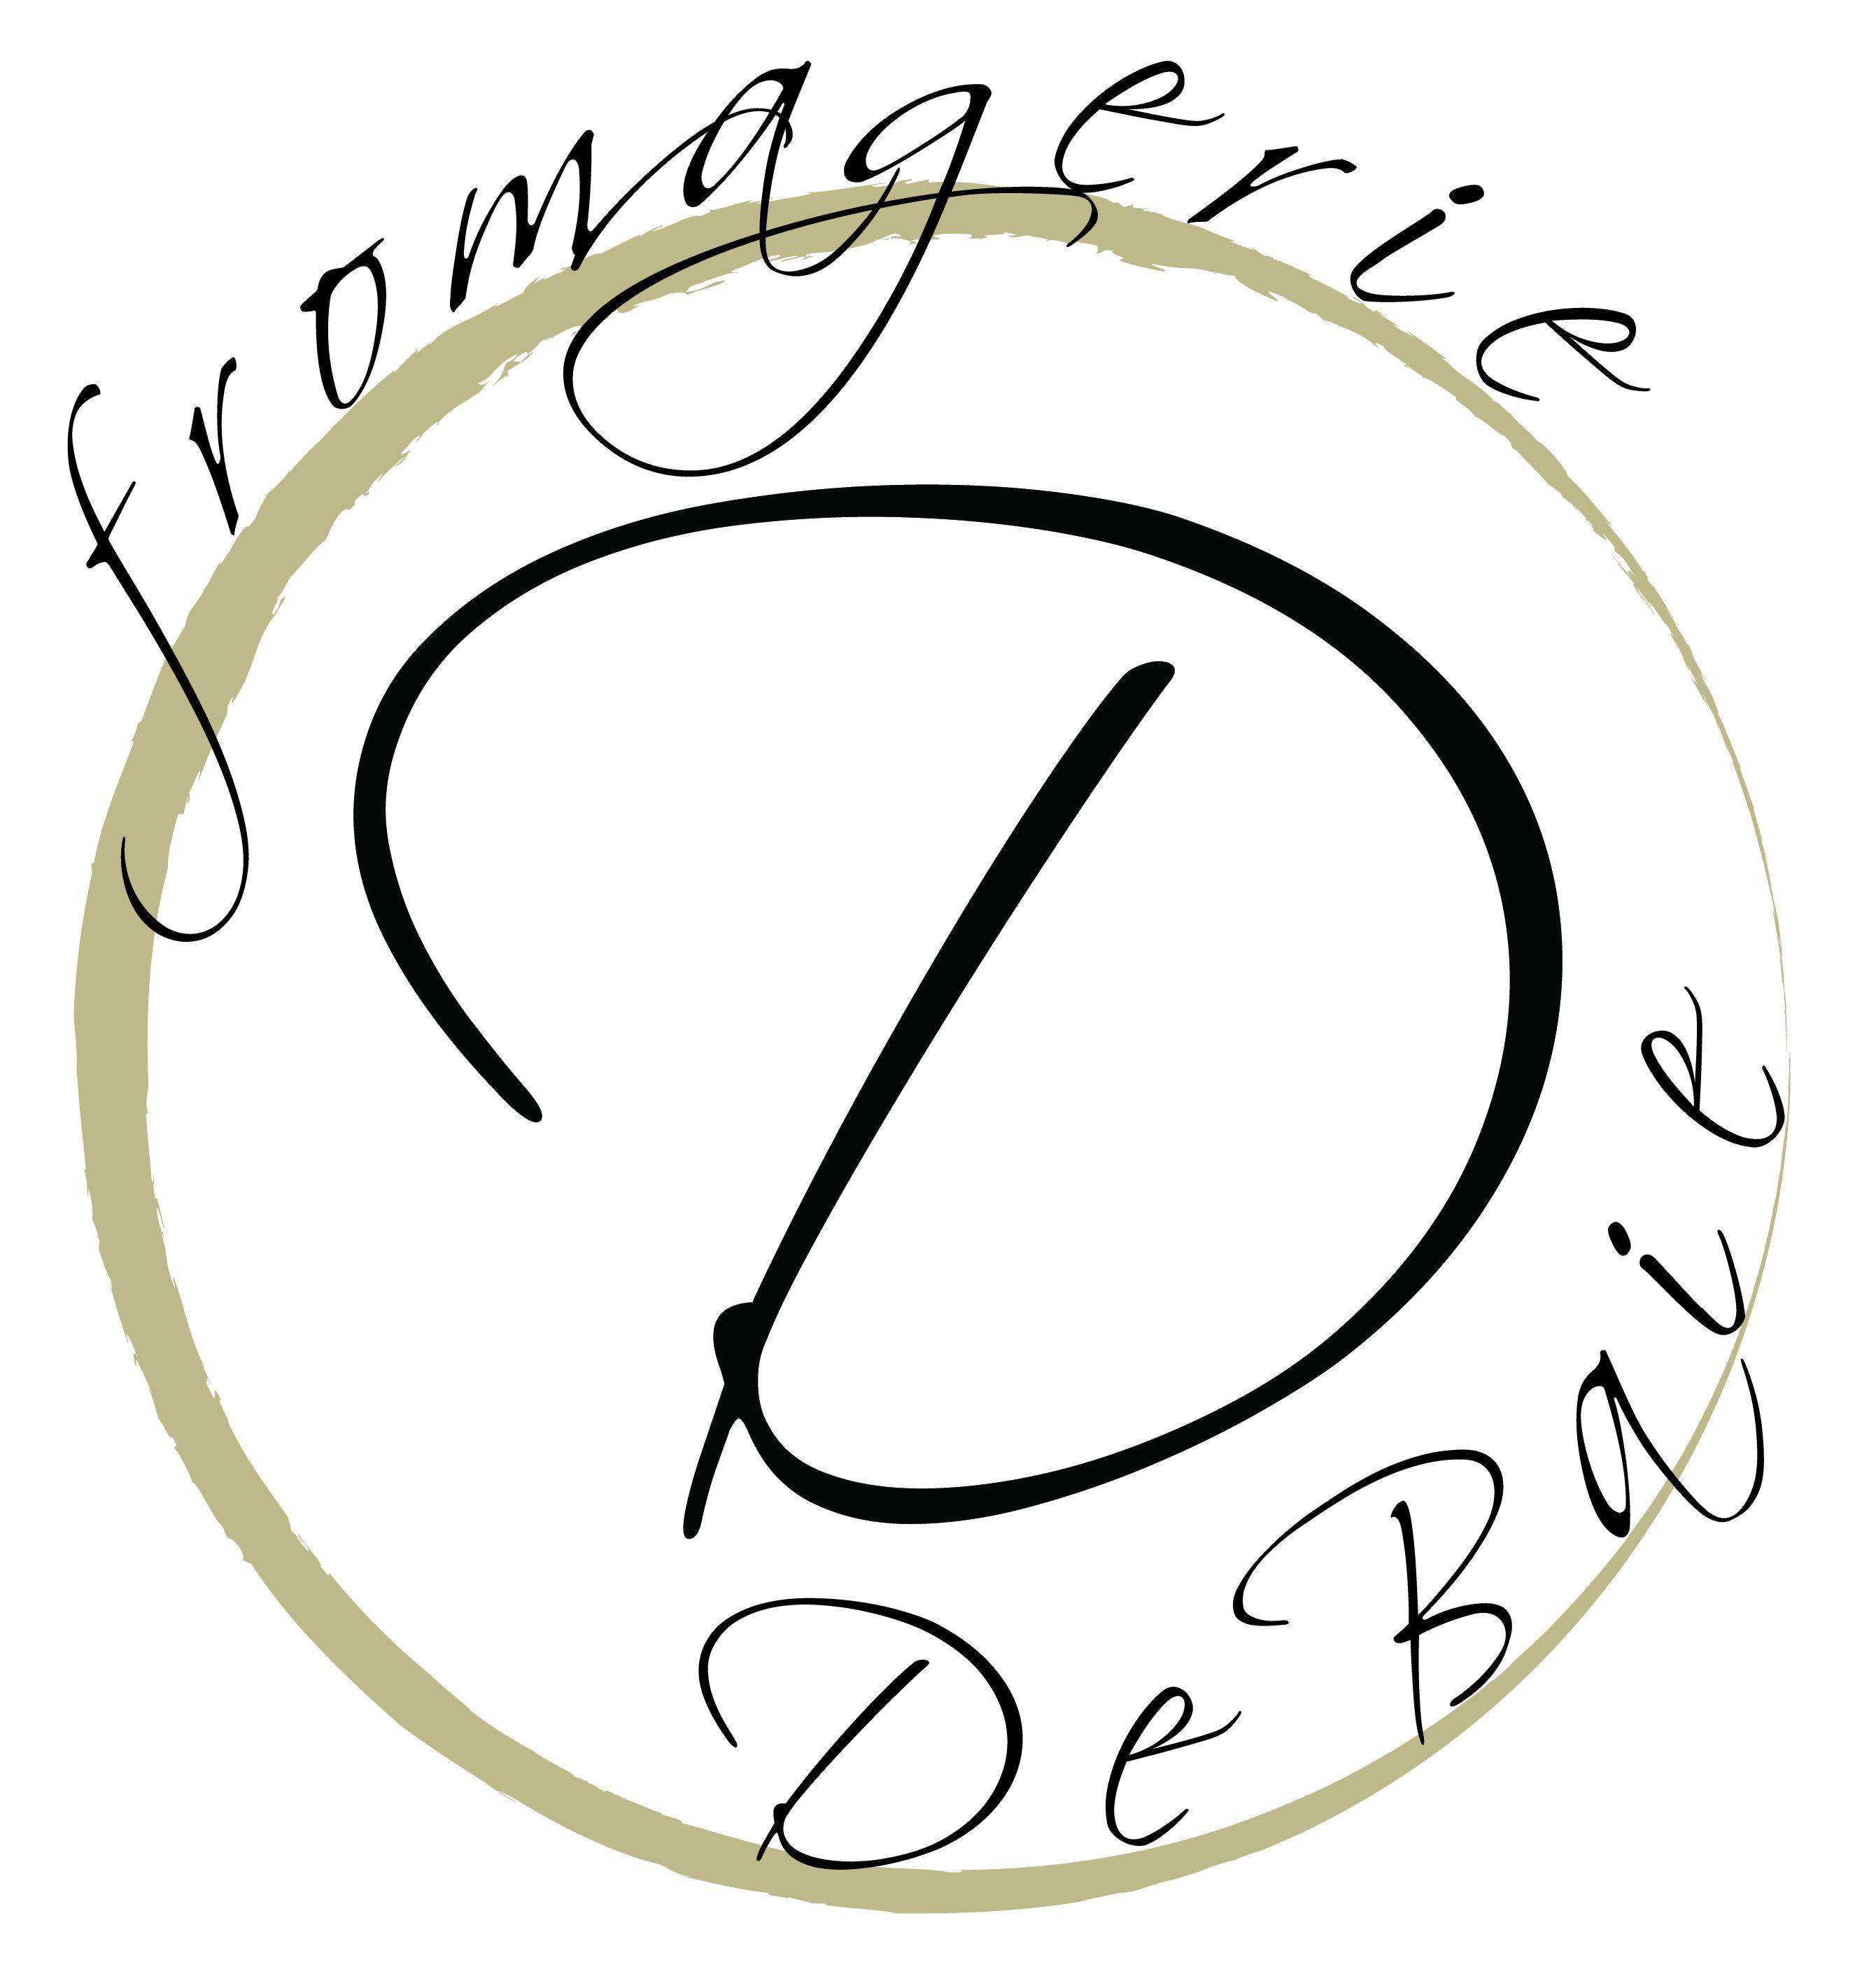 Fromagerie De Baie